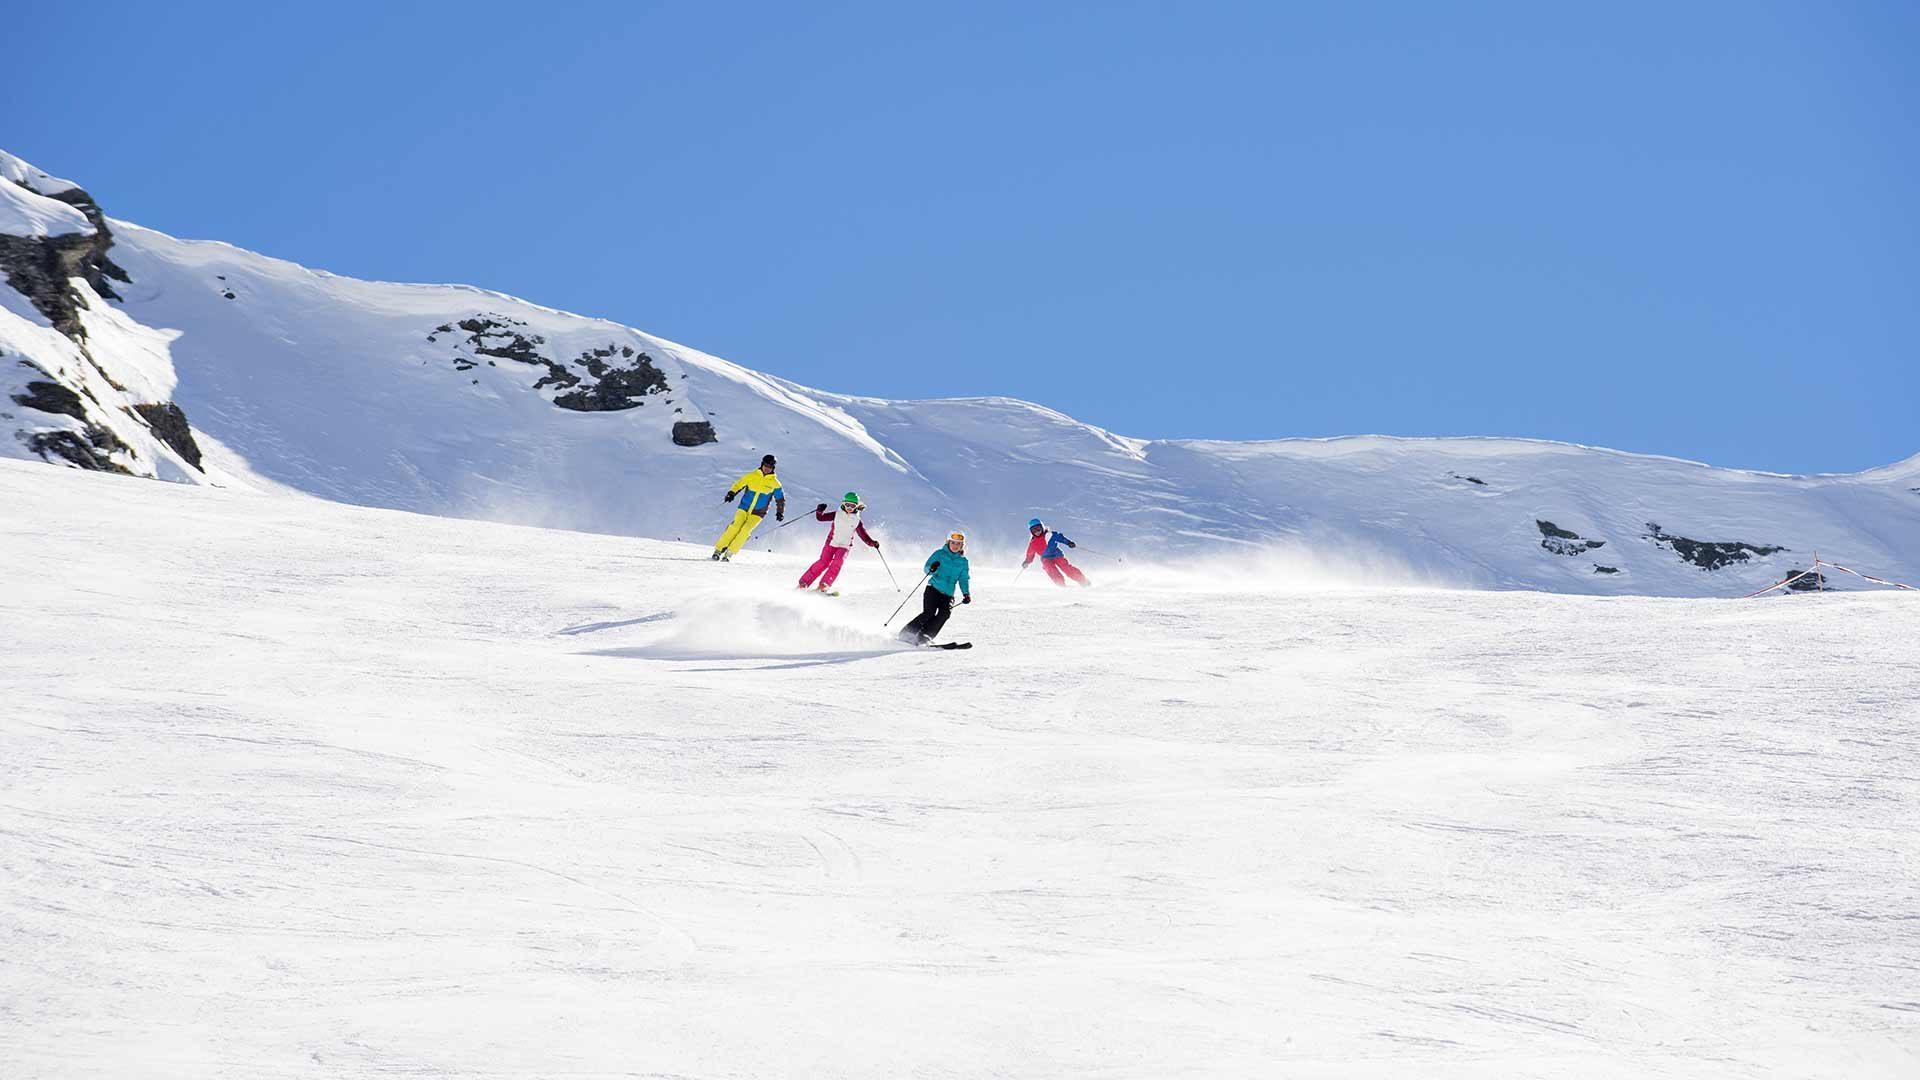 Area sciistica Plan Val Passiria - Vacanza invernale